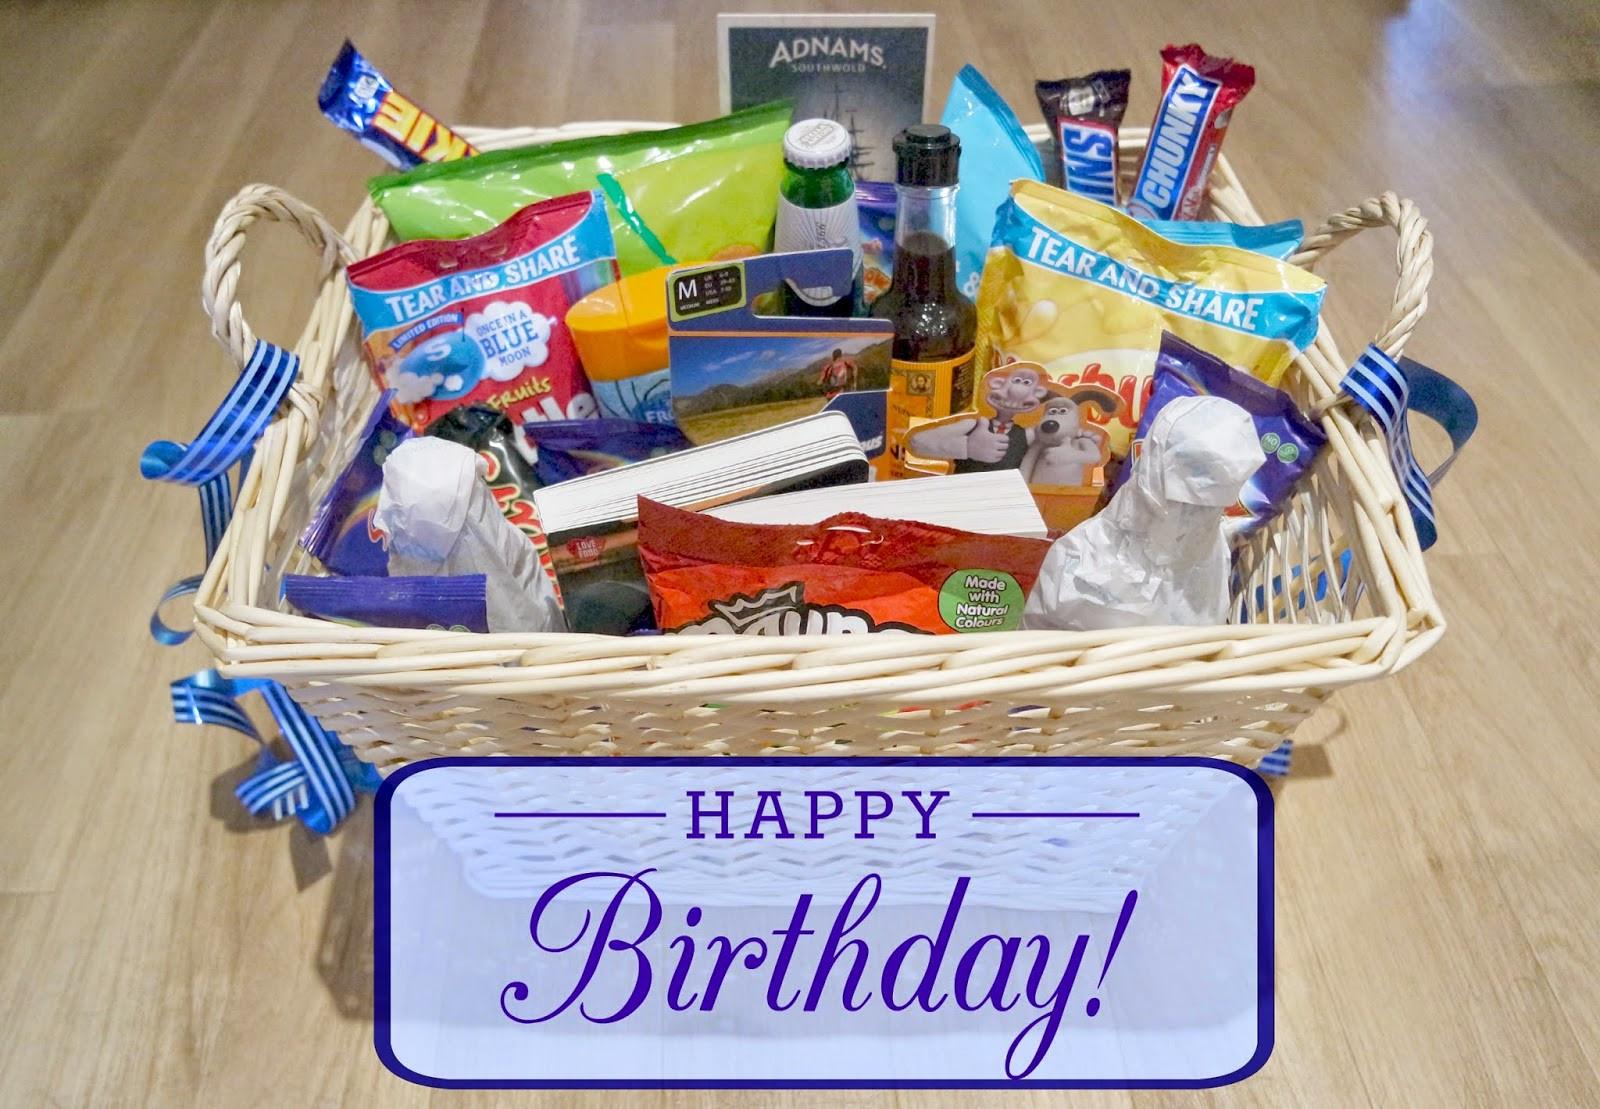 50Th Birthday Gift Ideas Men  Uptown Peach My Dad s 50th Birthday Hamper